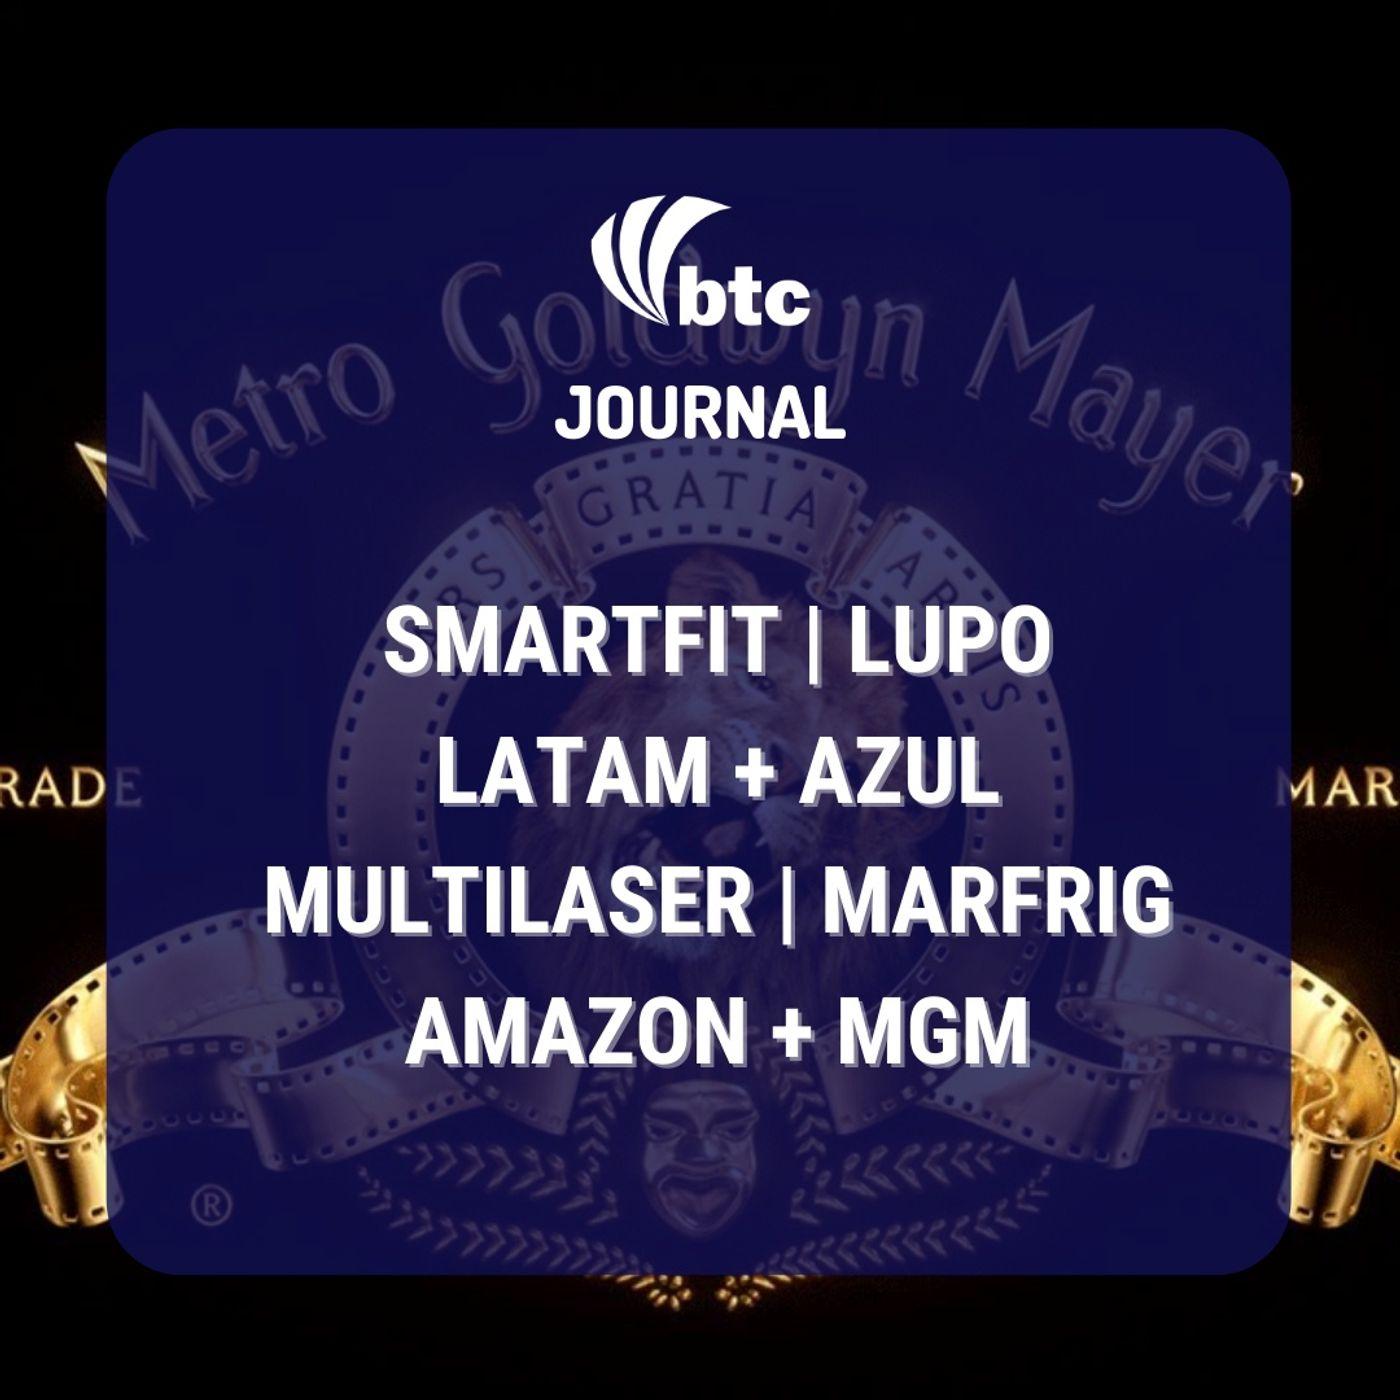 IPO Multilaser e Lupo, Nestlé, Marfrig, Azul + Latam, Amazon + MGM, Smartfit   BTC Journal 27/05/21